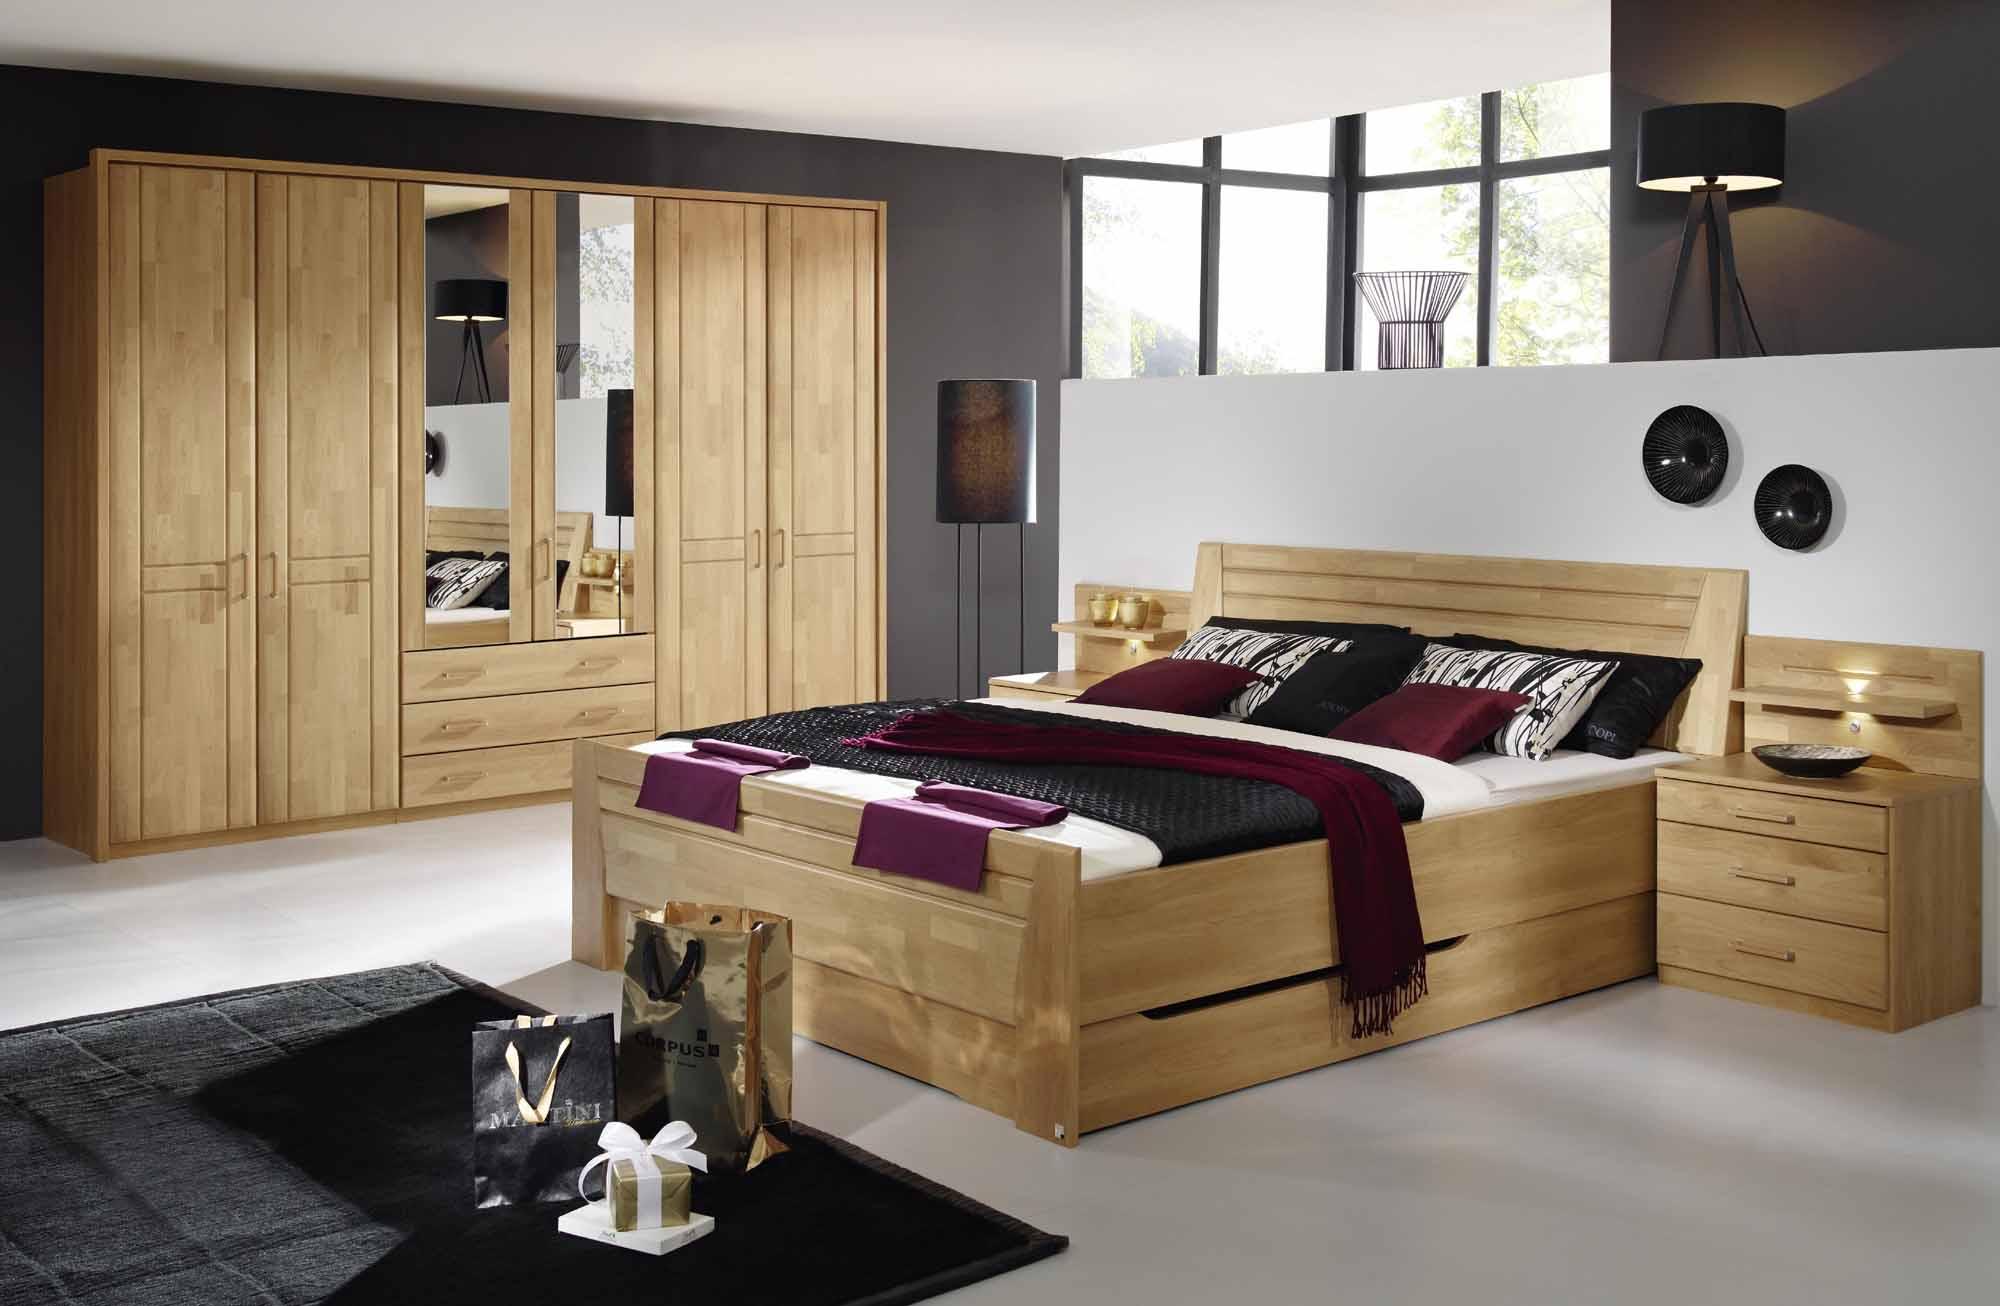 schlafzimmer br gge in erle online kaufen massiva m. Black Bedroom Furniture Sets. Home Design Ideas